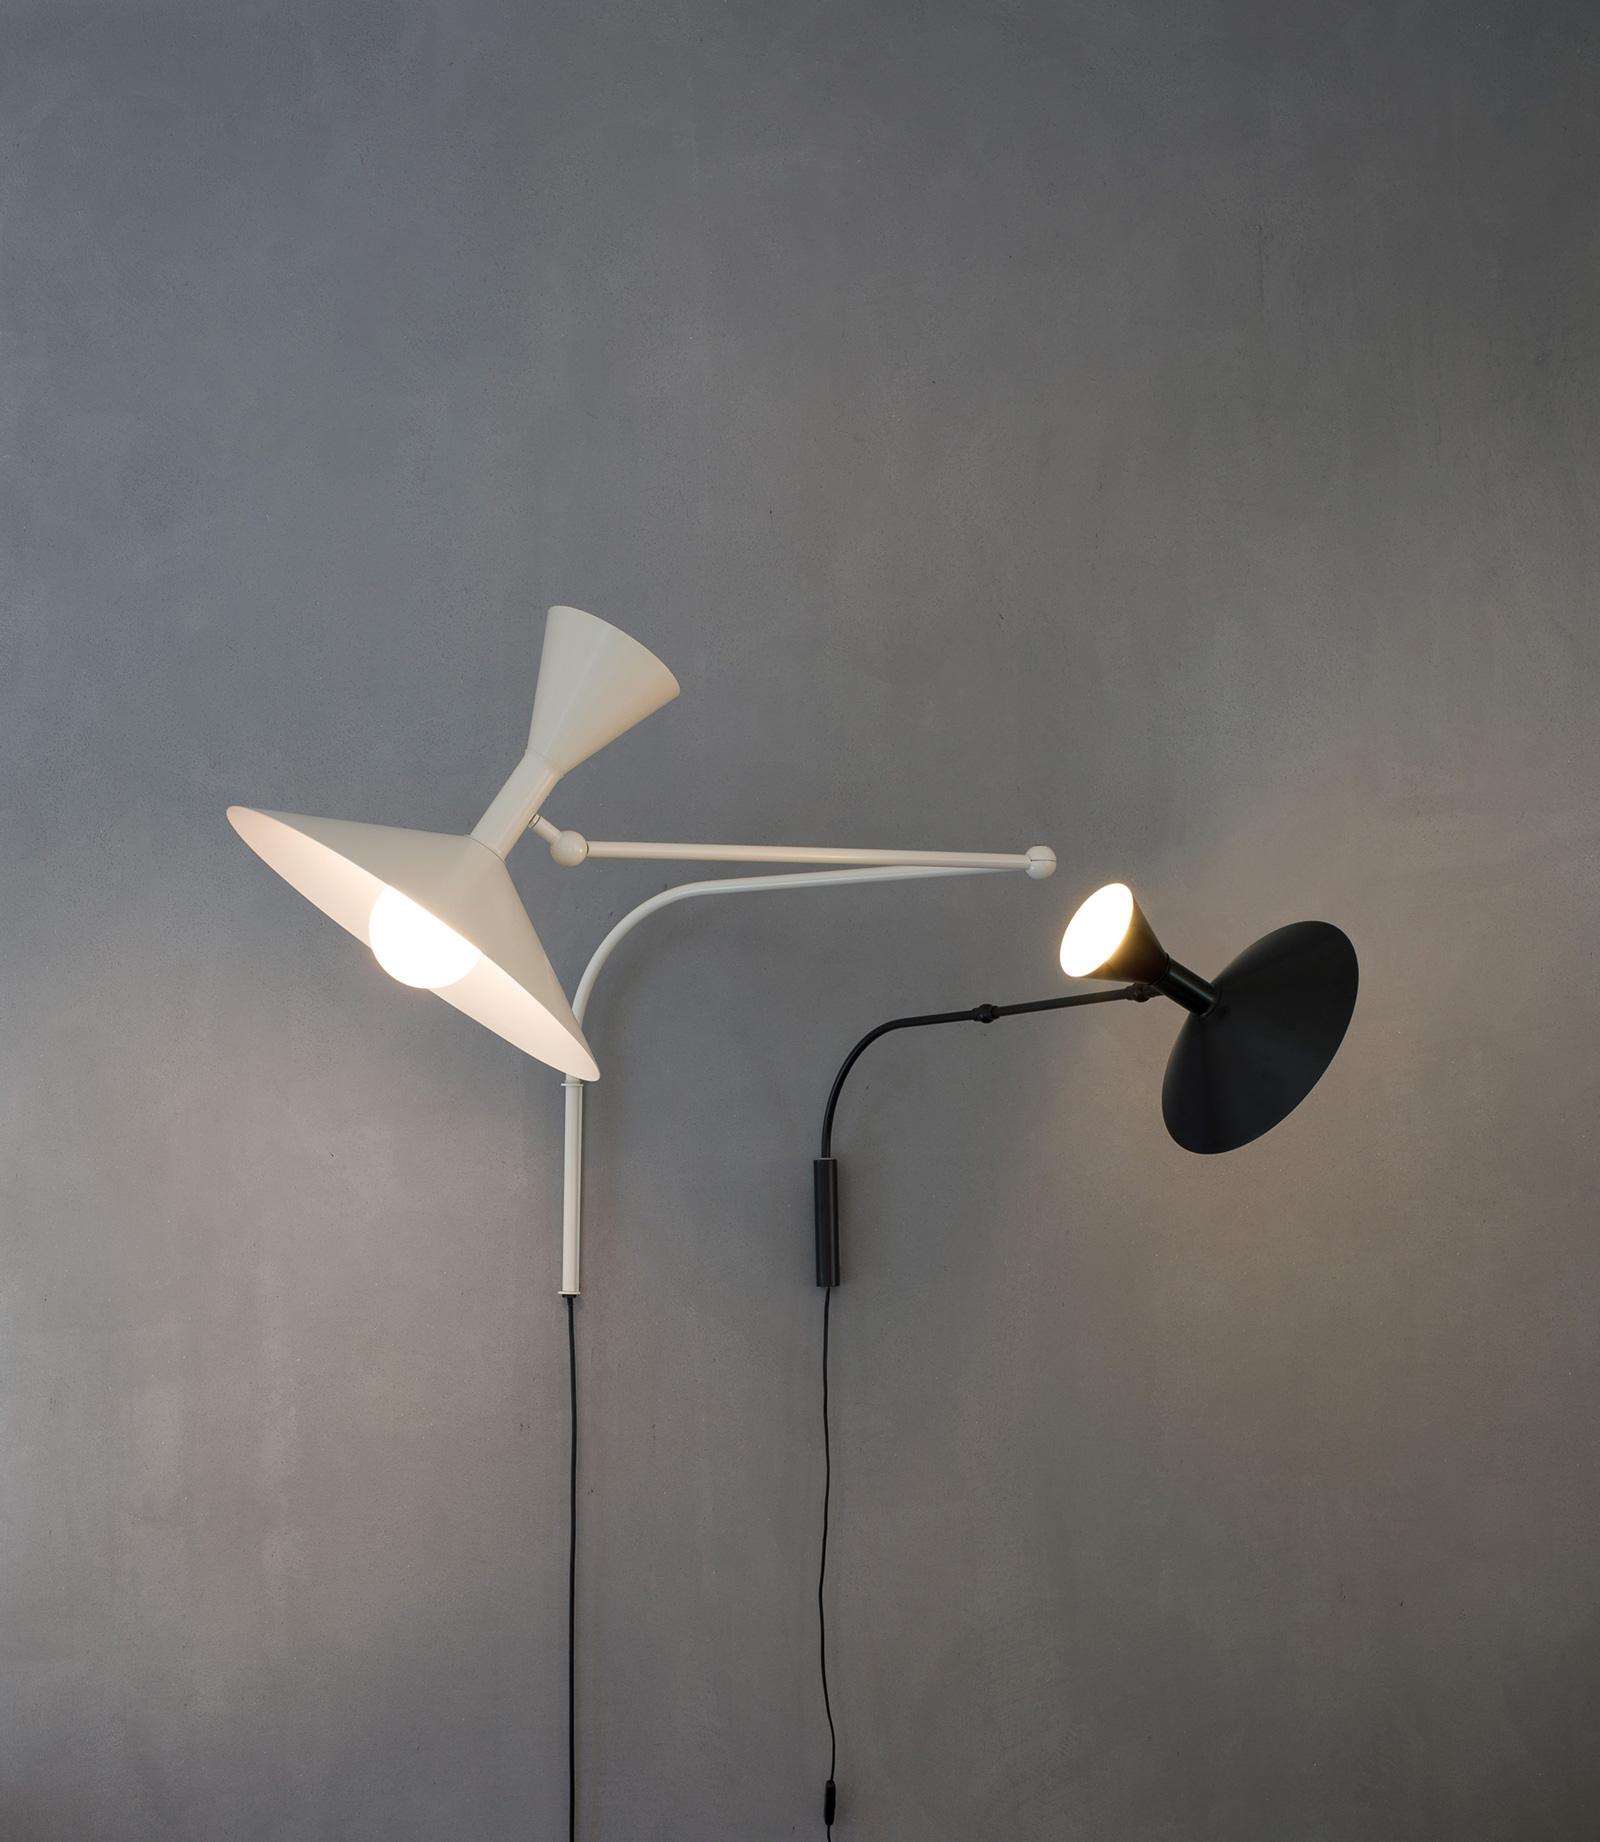 TinnappelMetz-nemo-Lampe-de-Marseille-wall-lamp-03